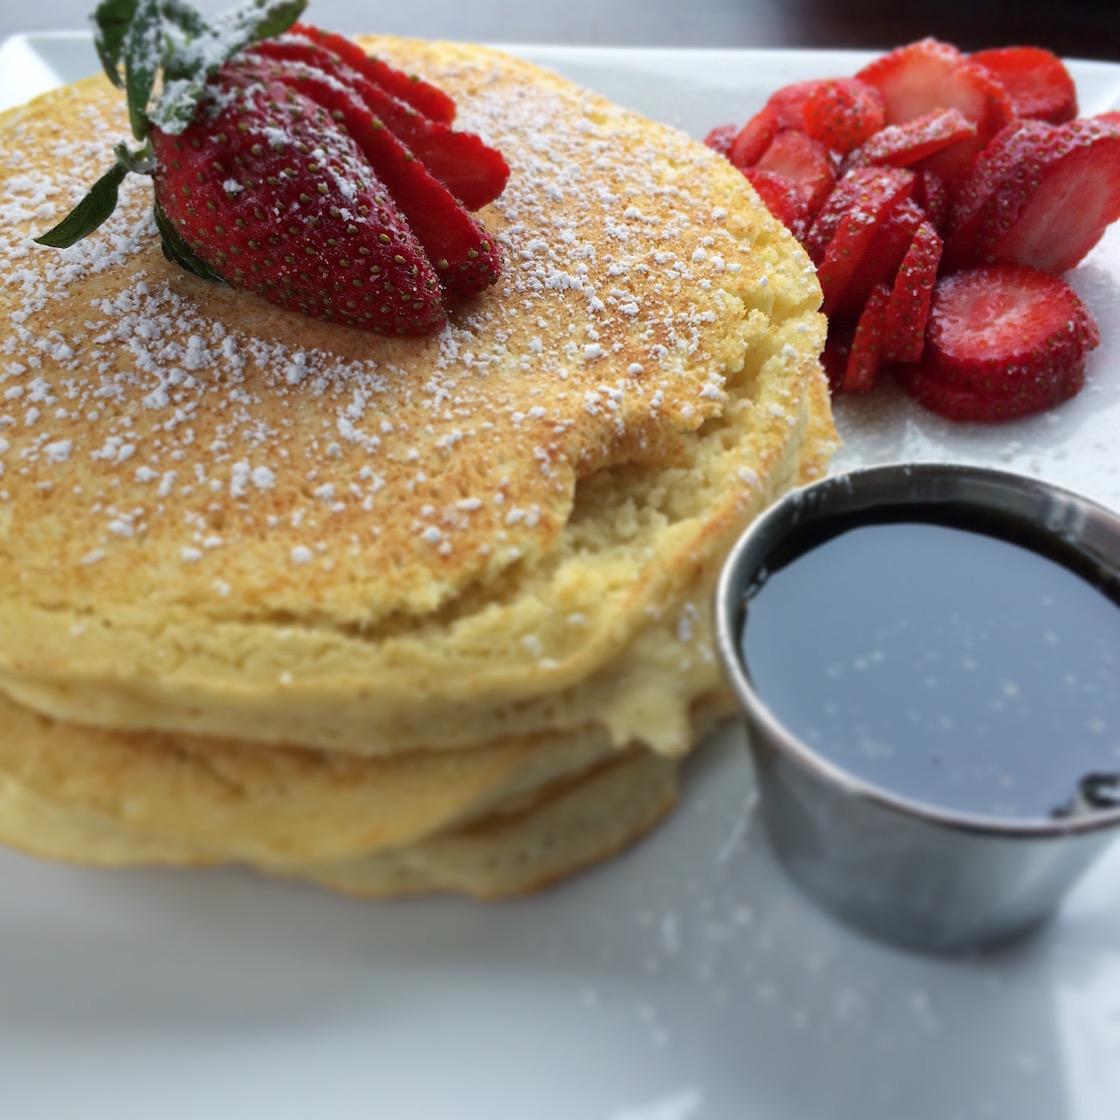 Pancakes at Astor Cafe in Harlem